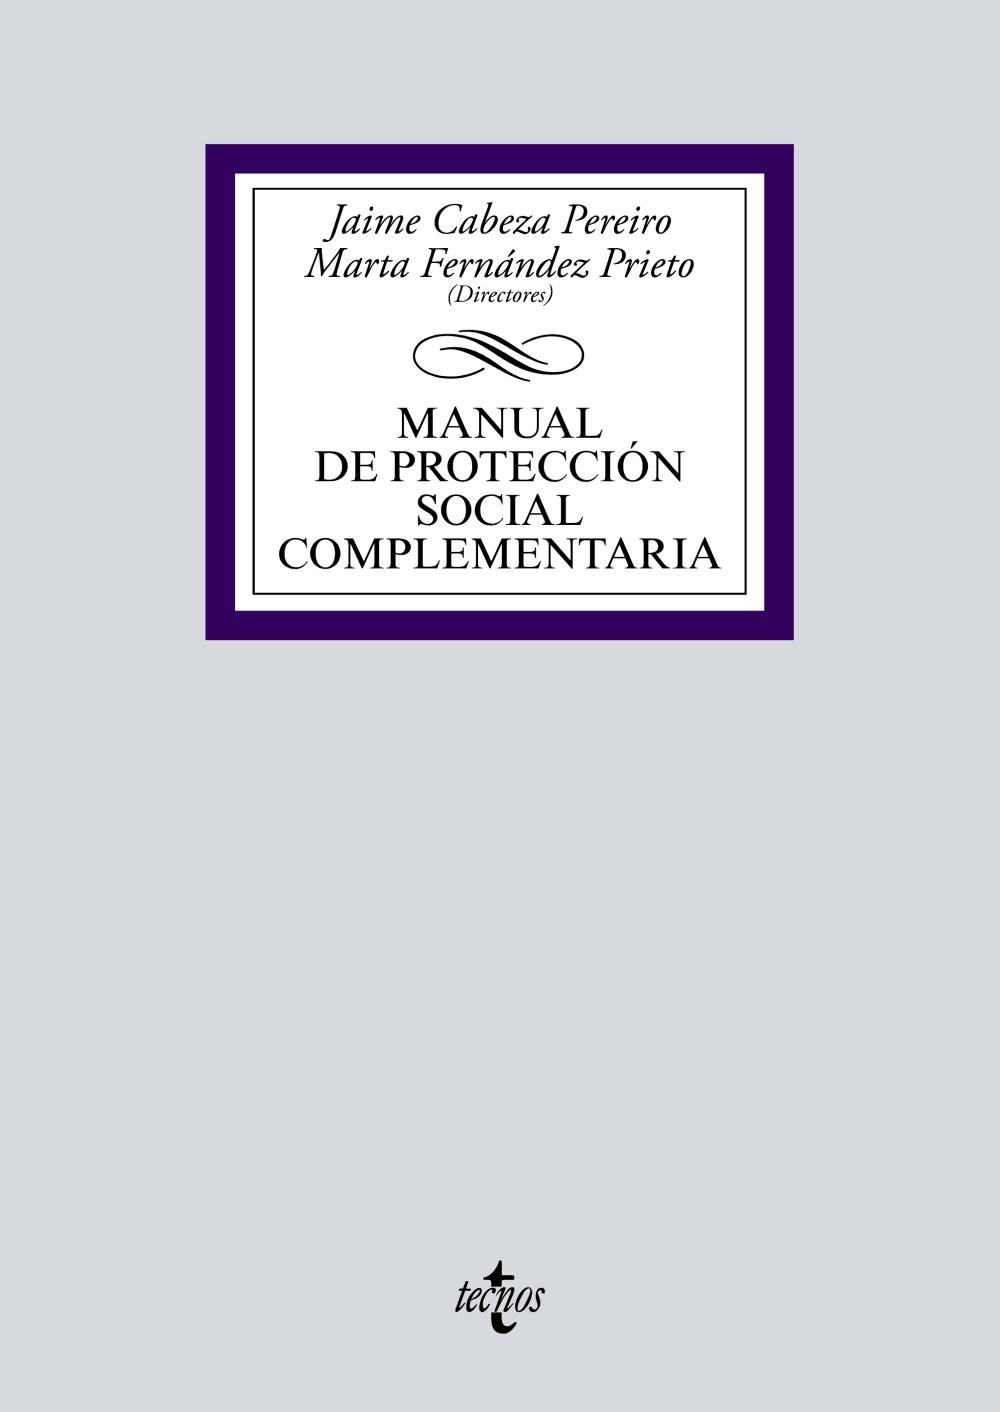 Manual De Proteccion Social Complementaria por Vv.aa.